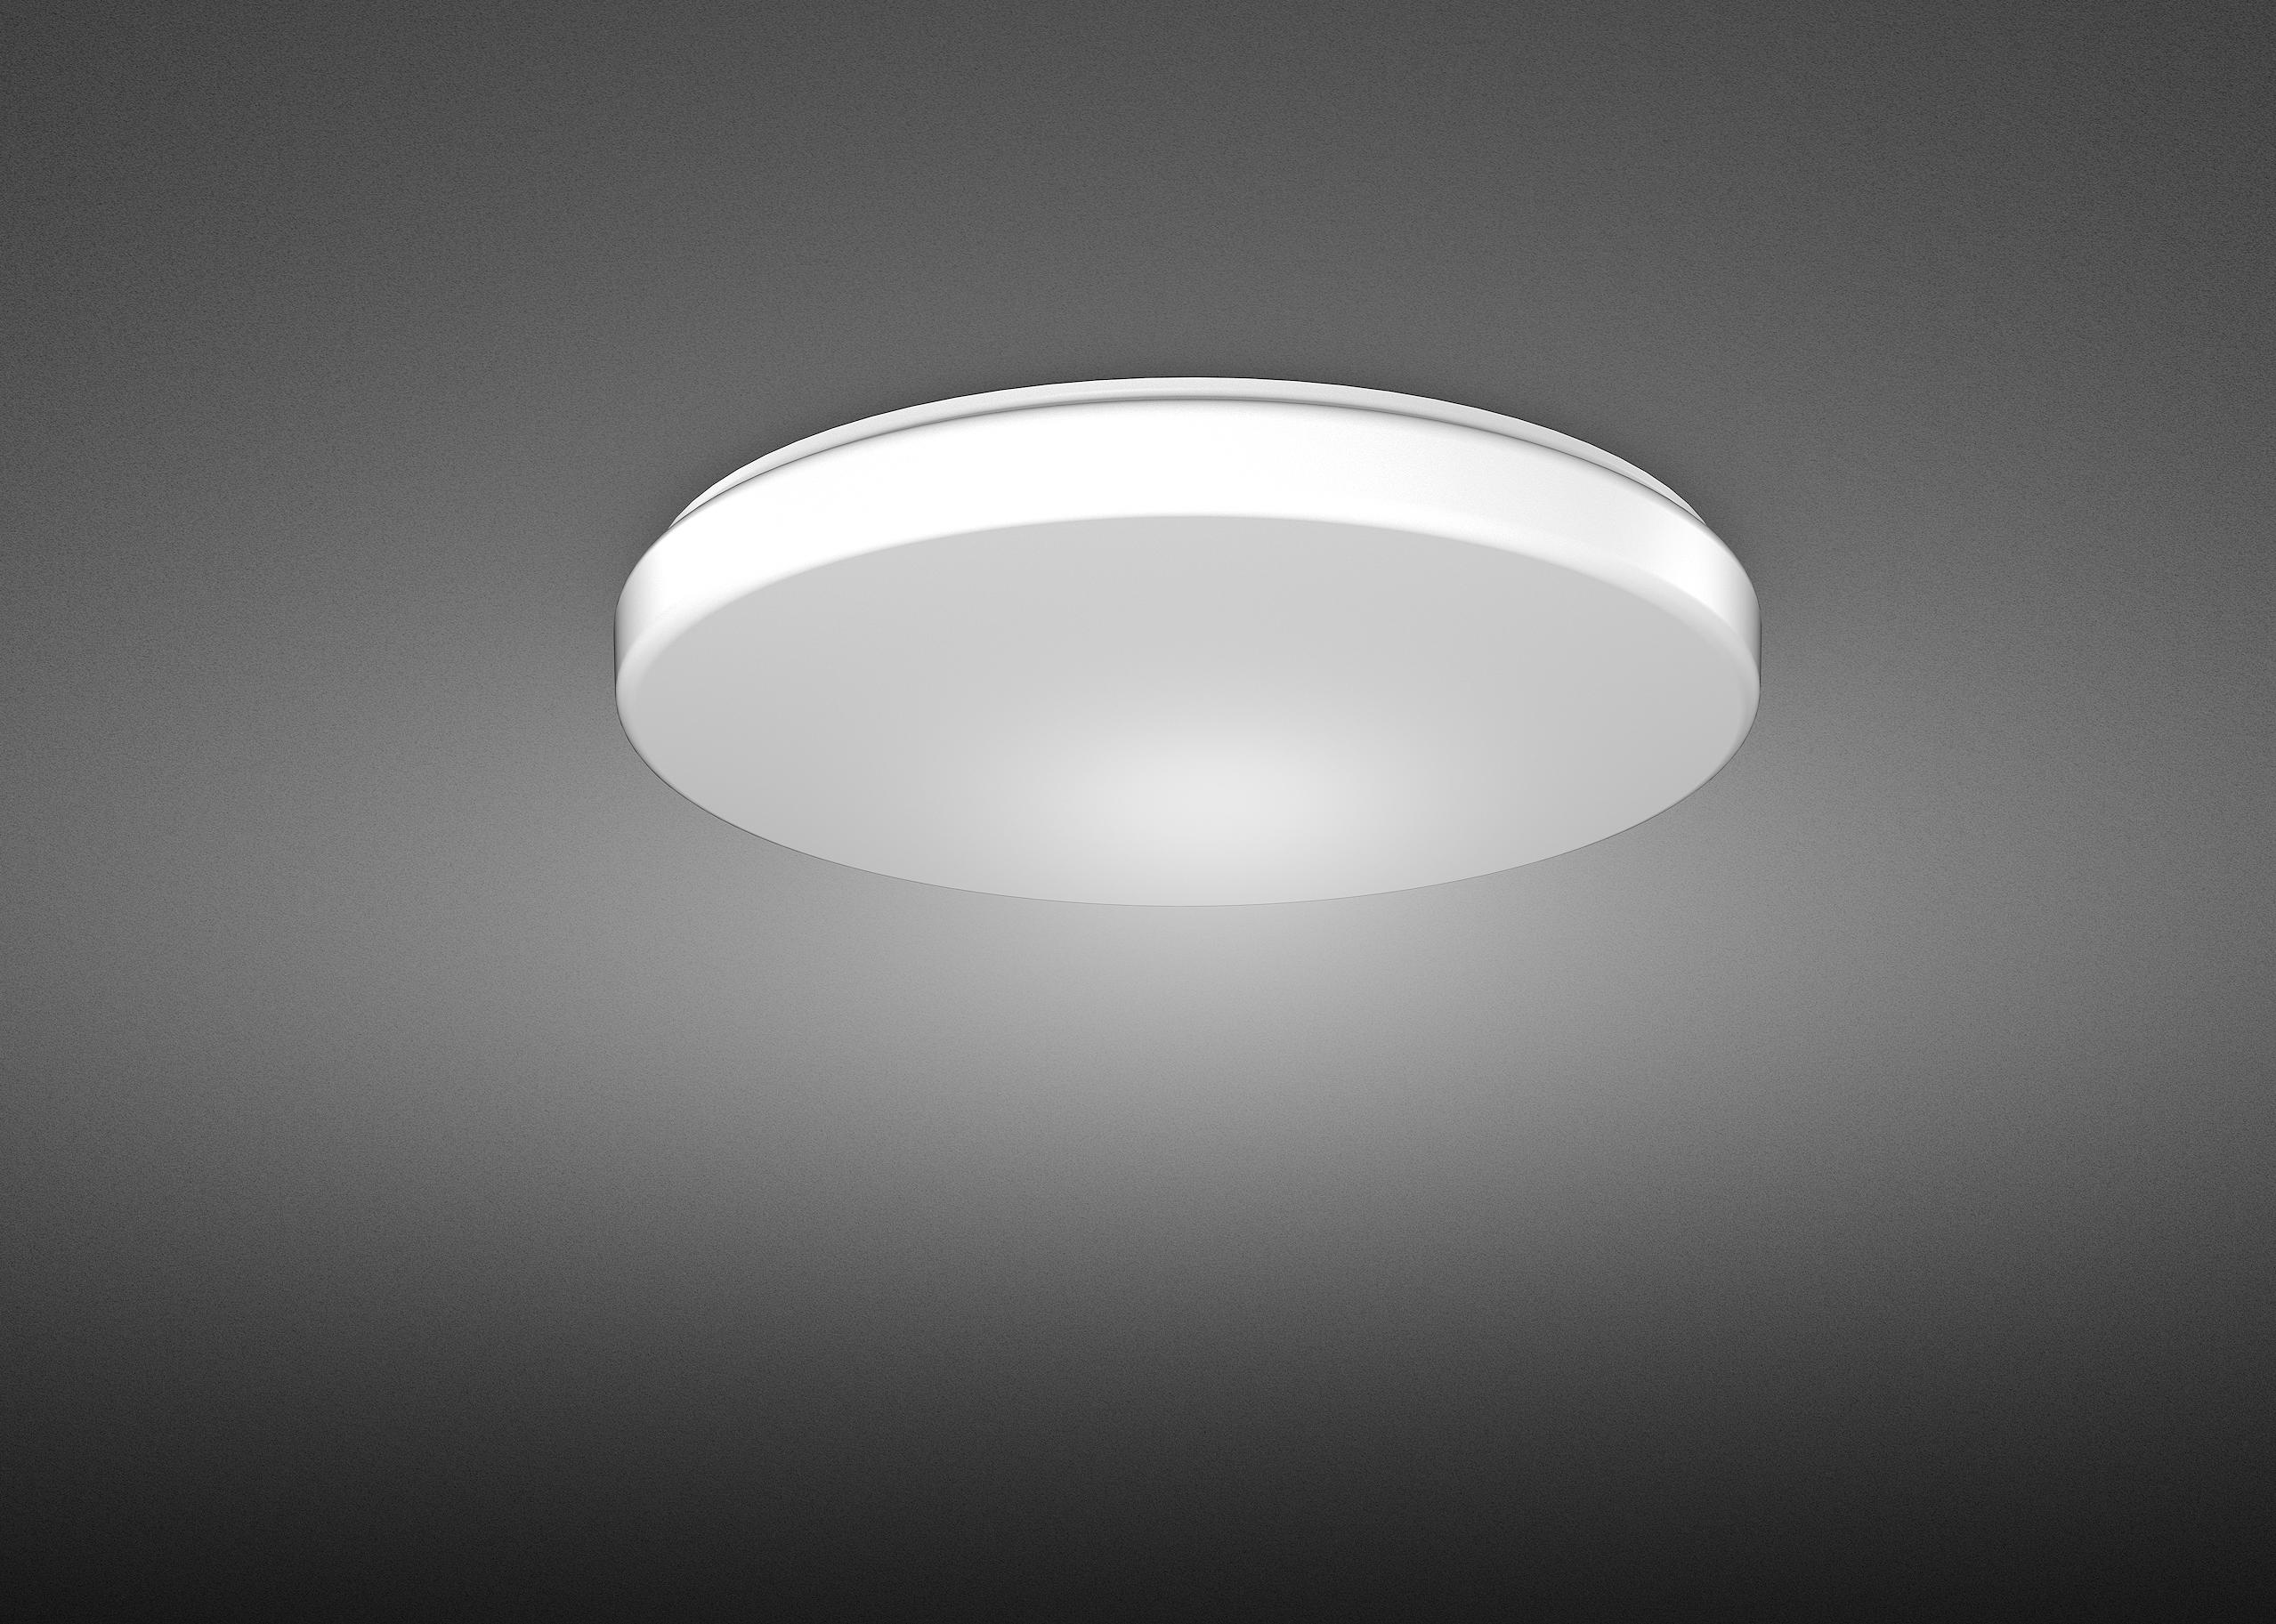 Flat Polymero Kreis Slim Ceiling And